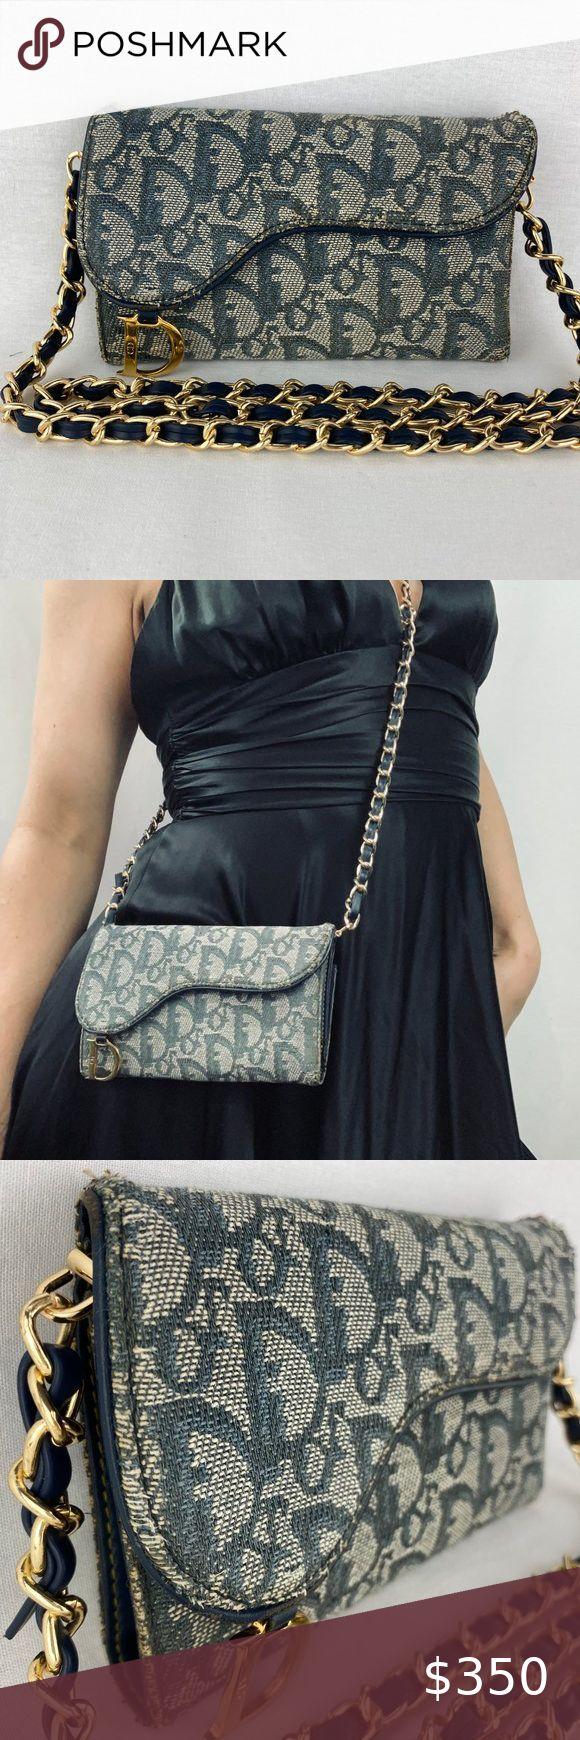 Sold Dior Navy Trotter Saddle Wallet On Chain Dior Vintage Dior Trotters